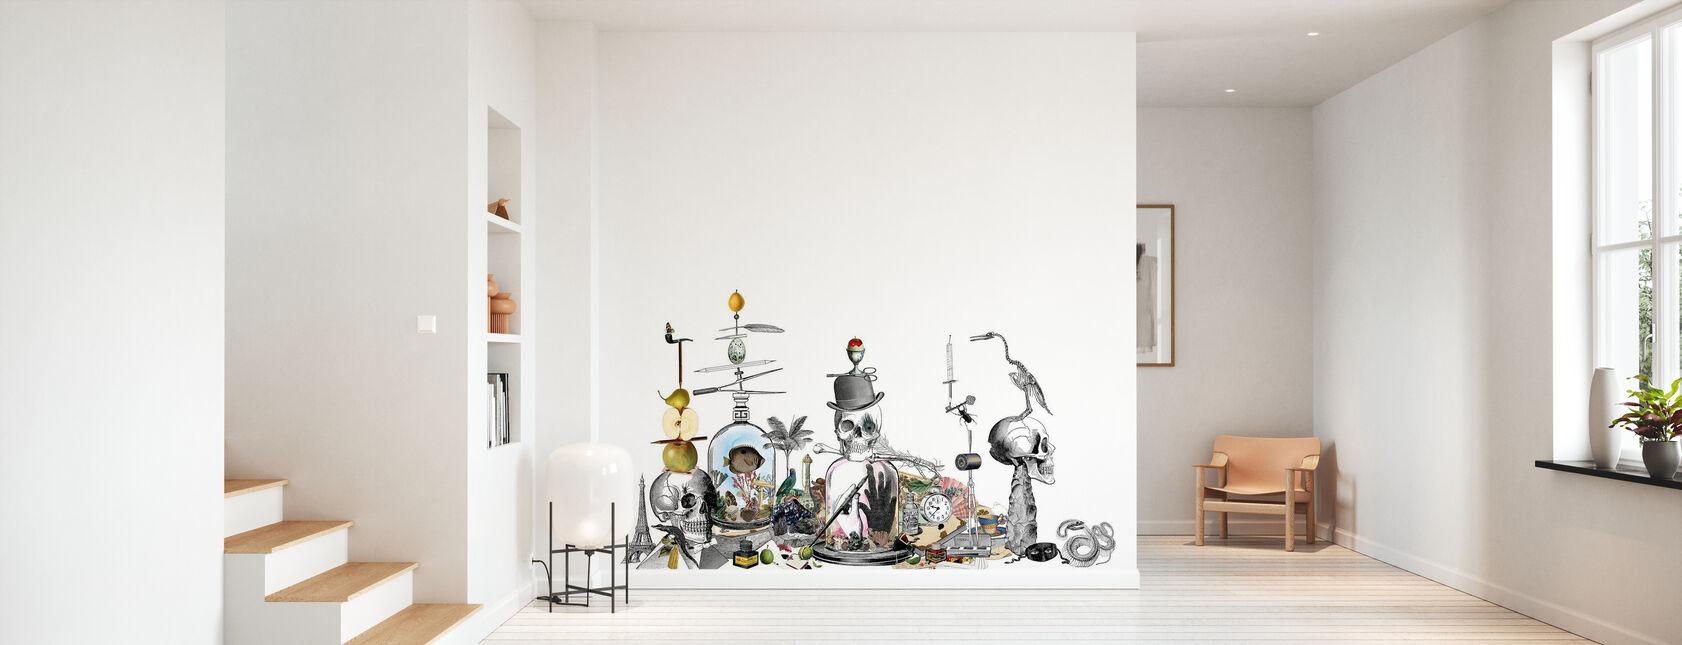 Junkyard - White - Wallpaper - Hallway